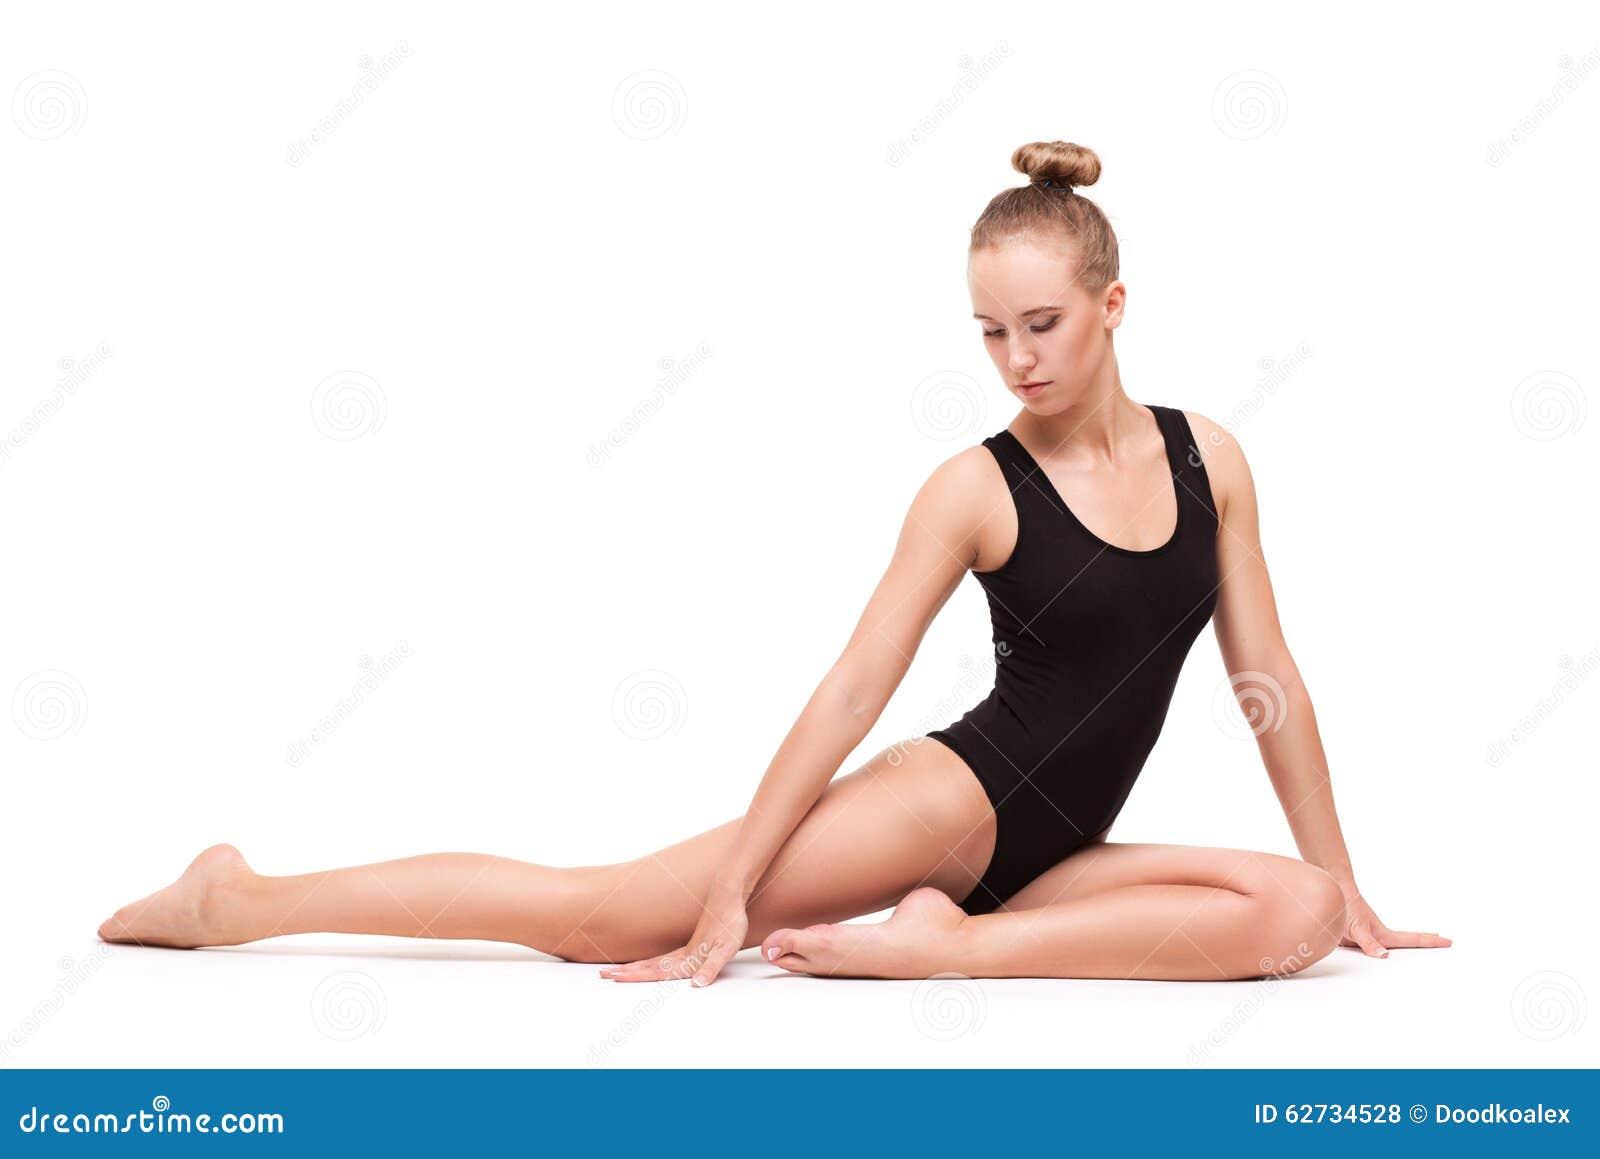 black naked female body